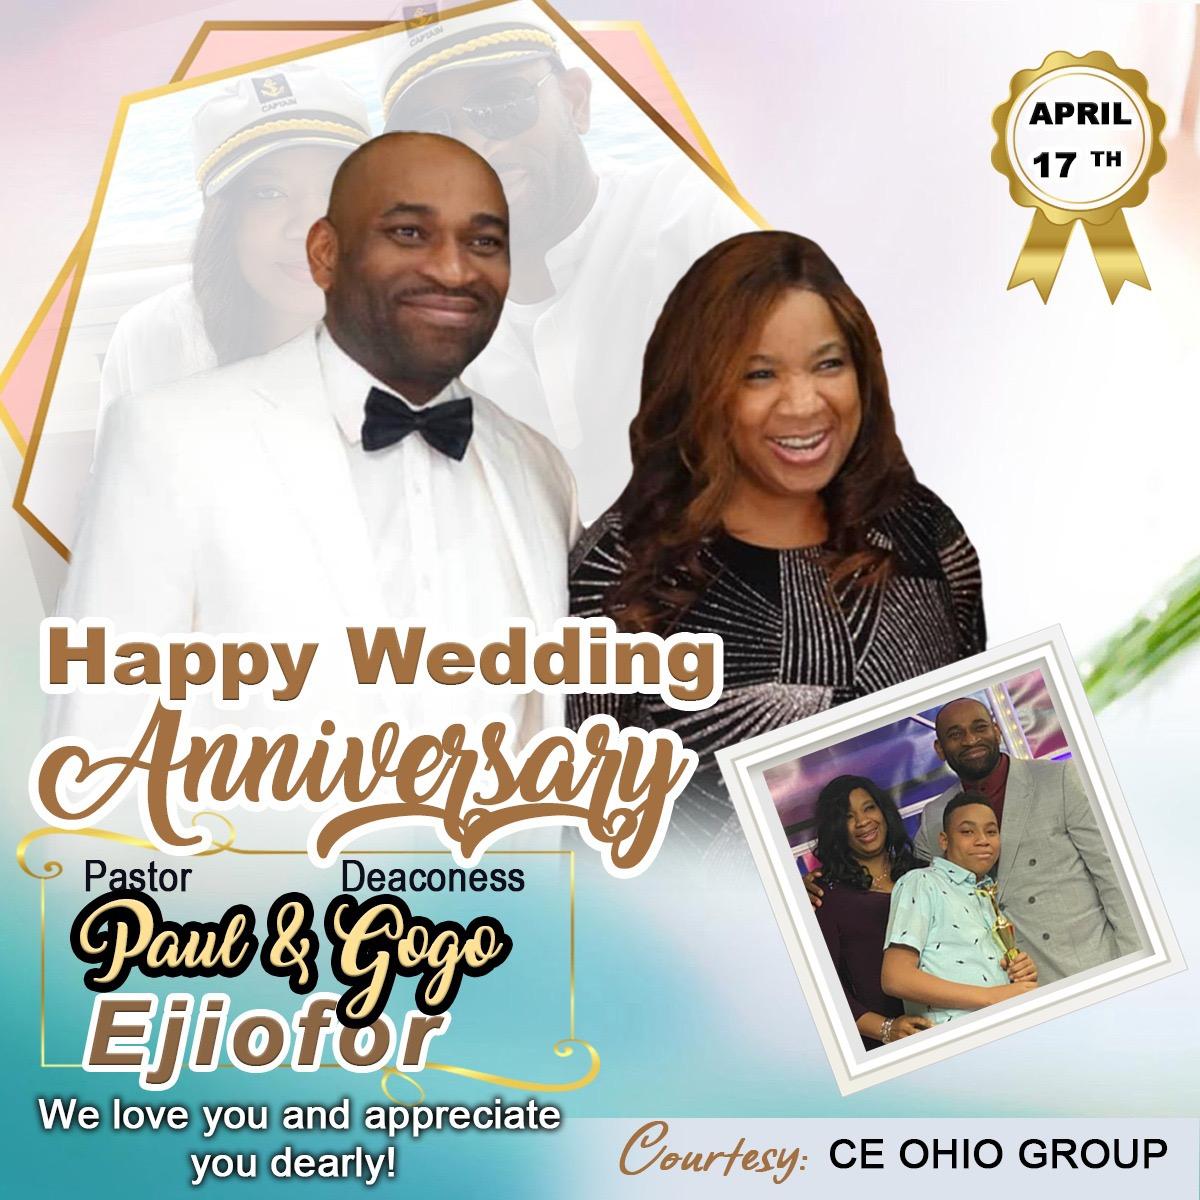 Happy Wedding Anniversary Esteemed Pastor